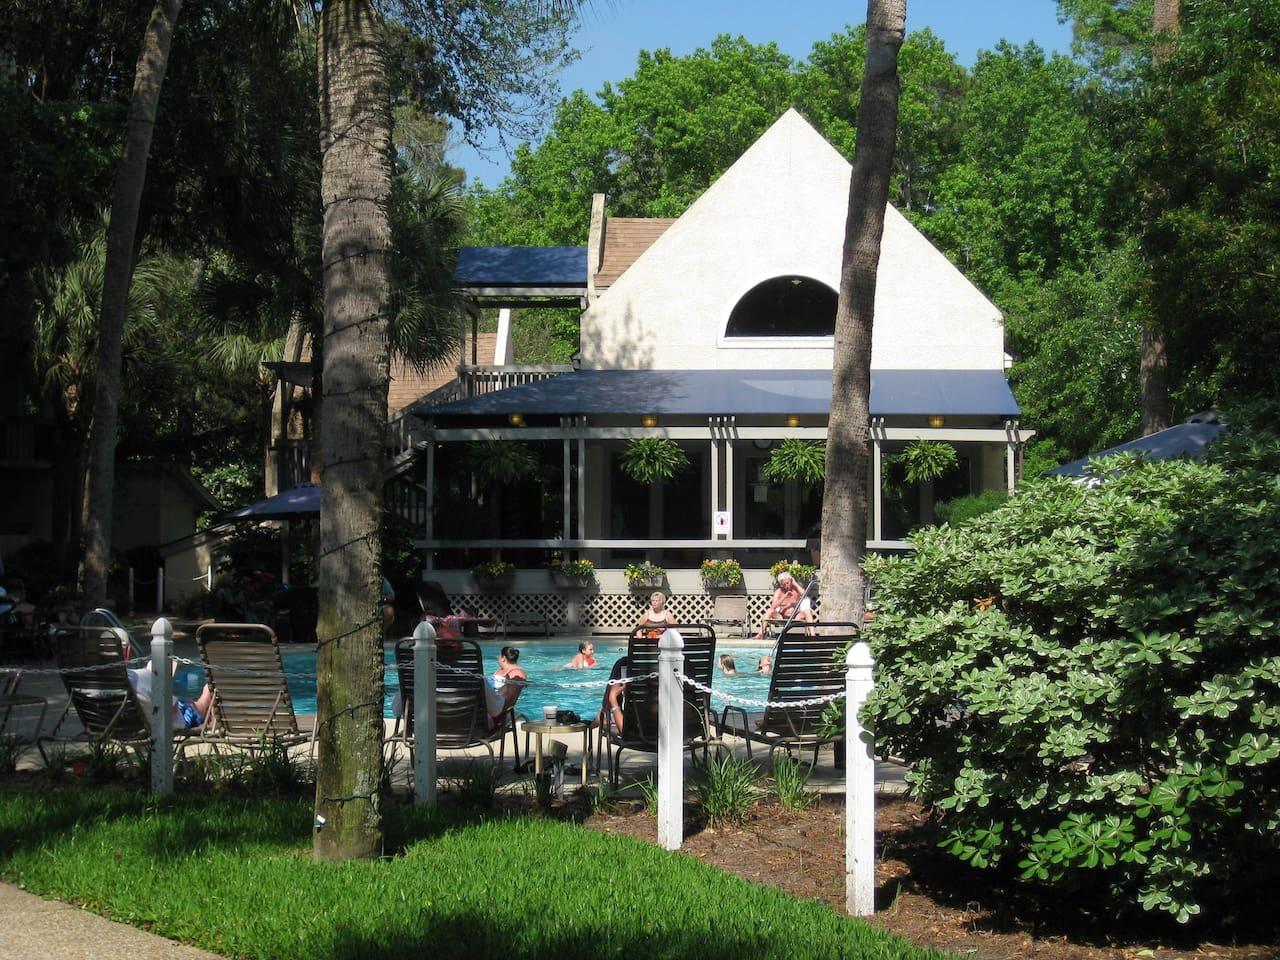 The Seacrest Pool